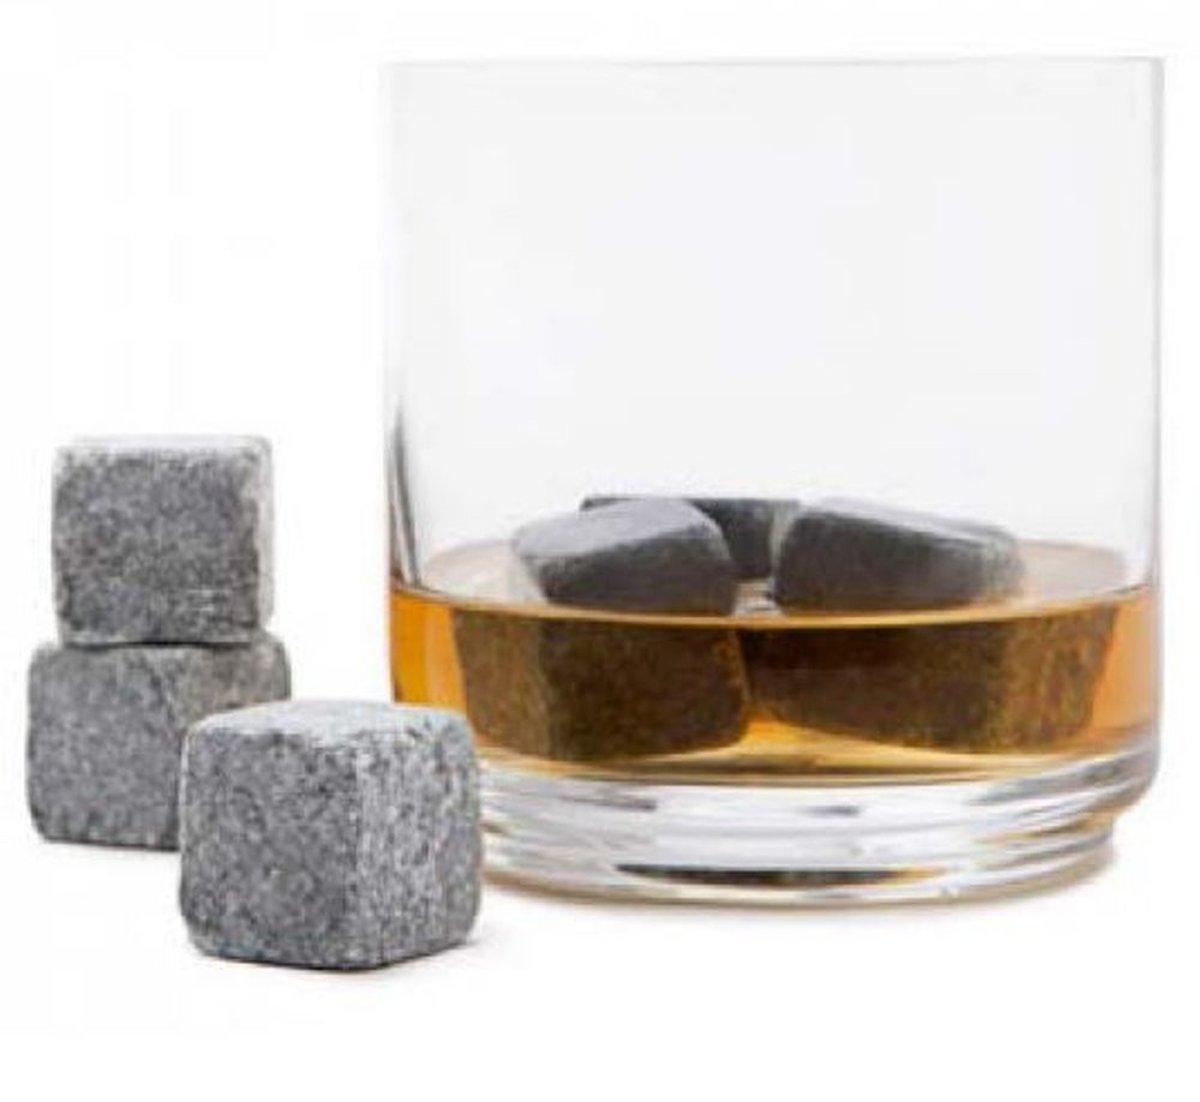 Invotis - Wisky Stones (9 pcs) kopen